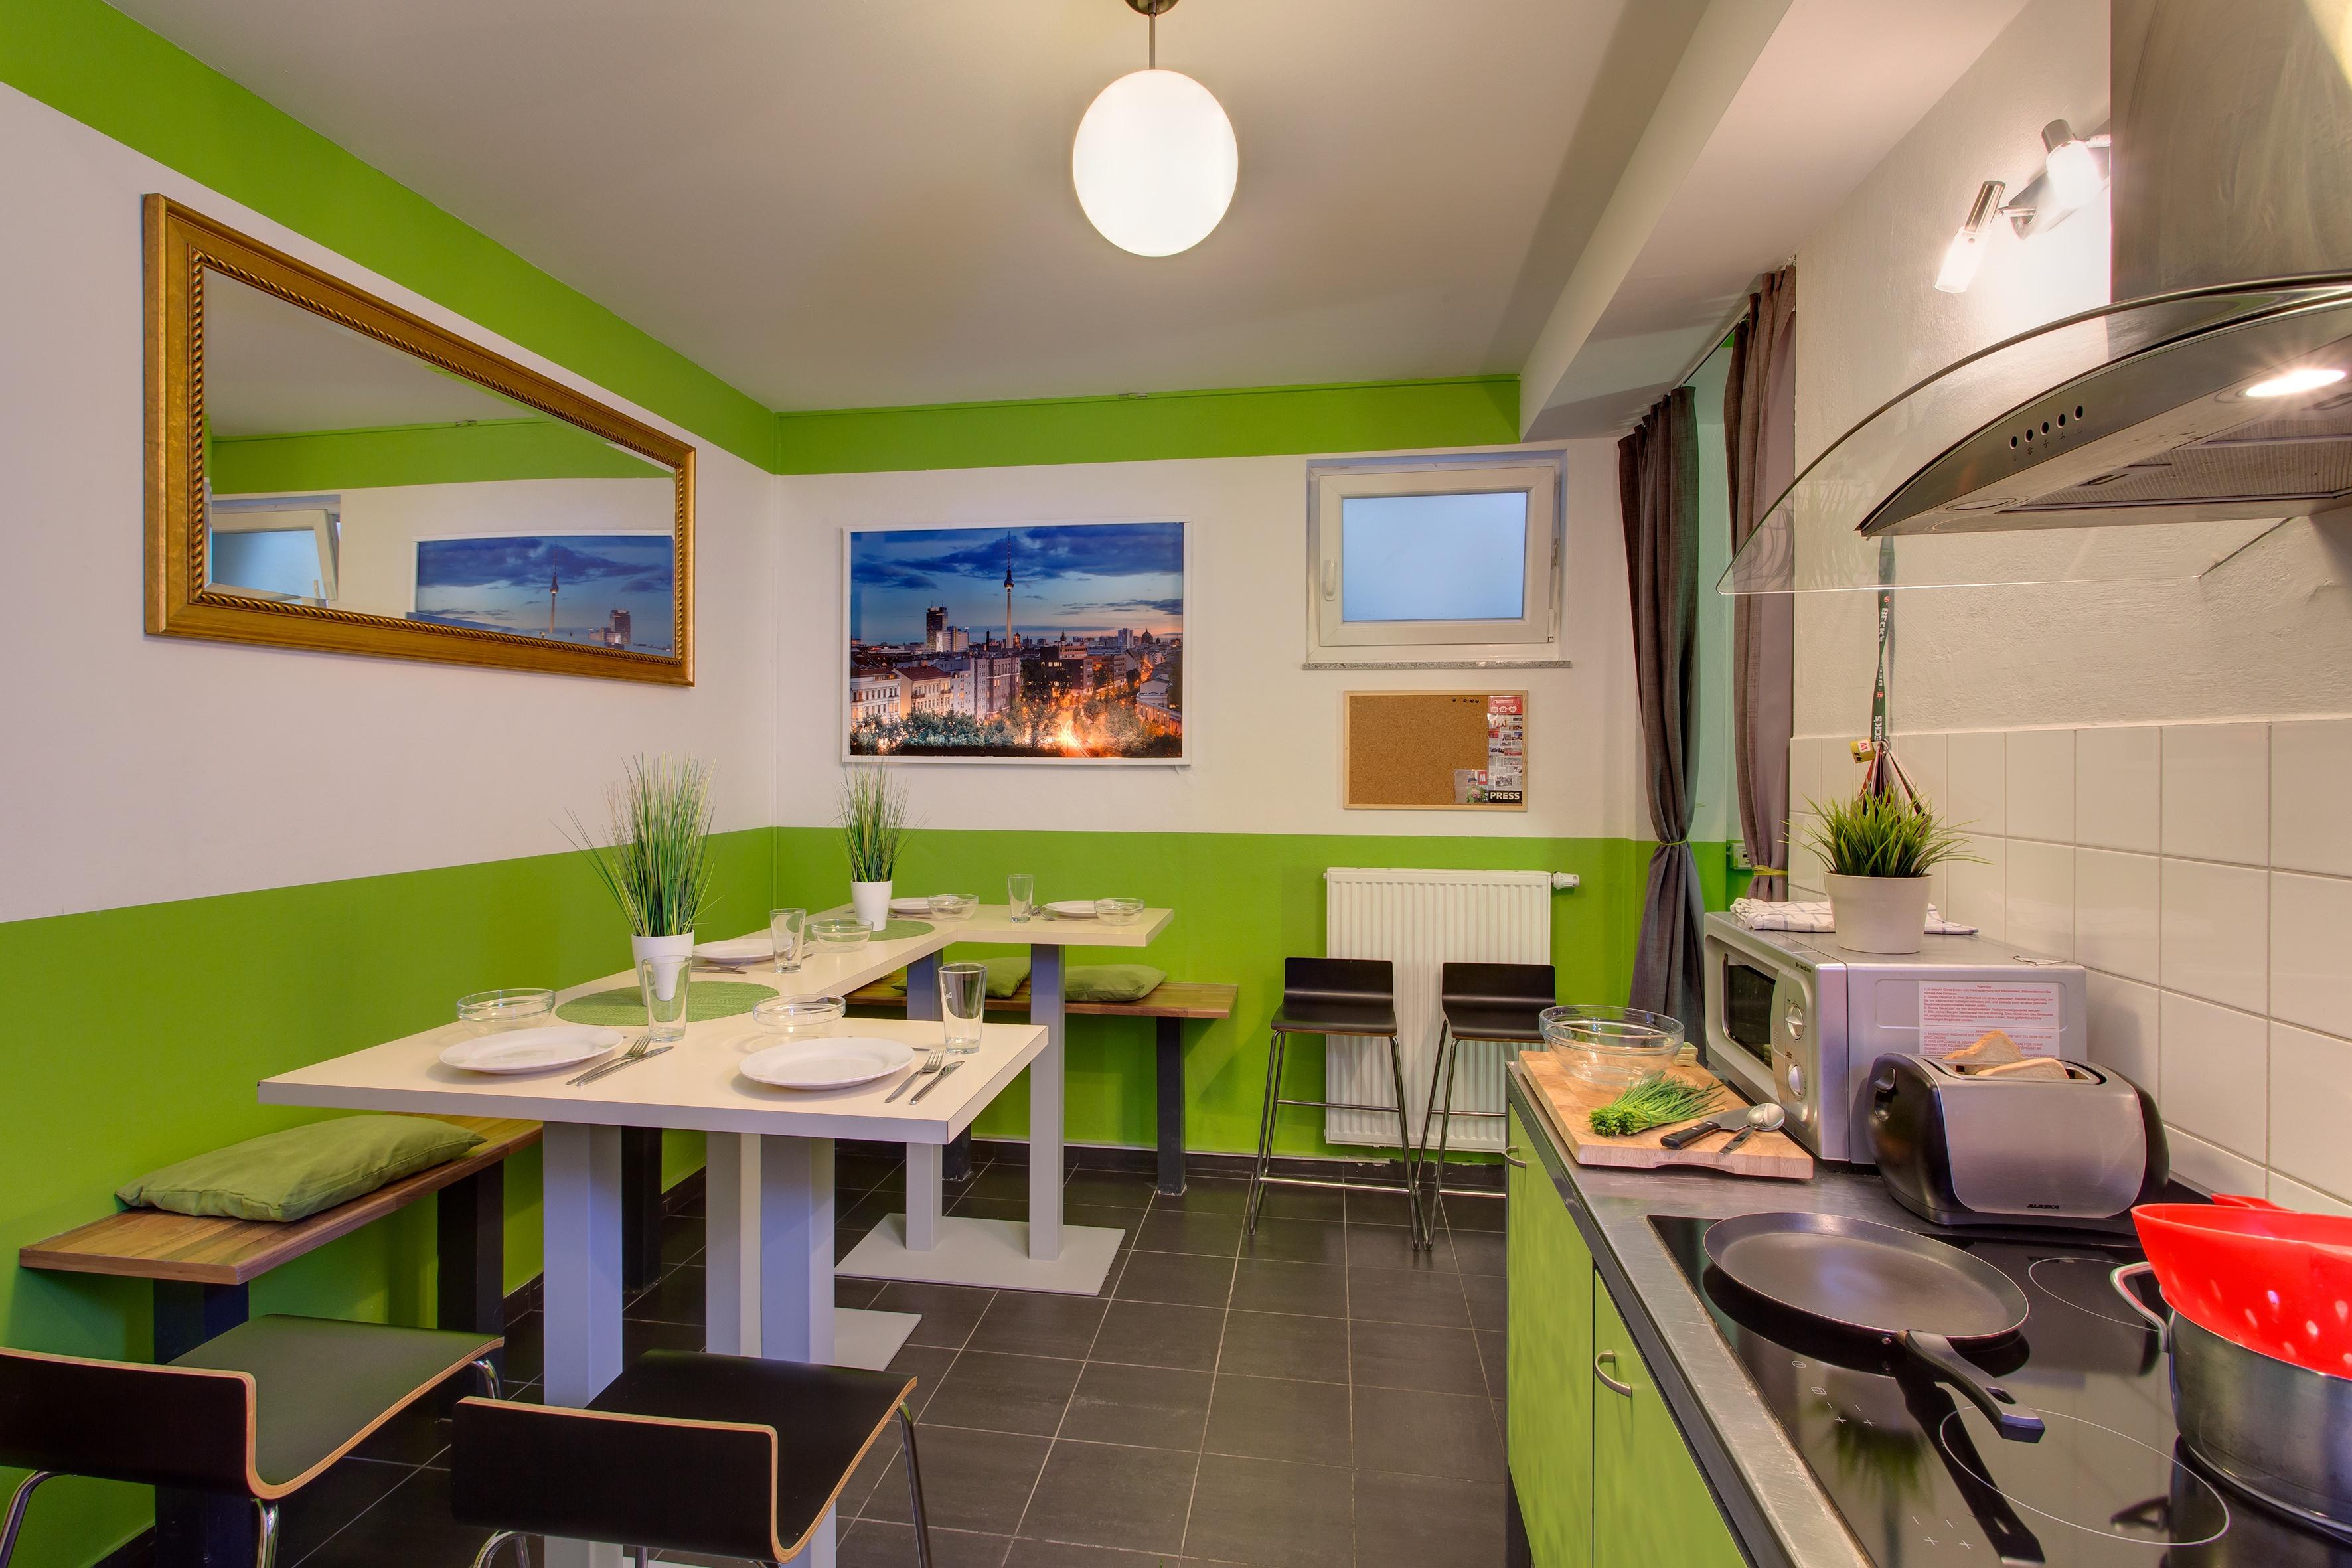 MEININGER Hotel Berlin Alexanderplatz - Cocina para huéspedes